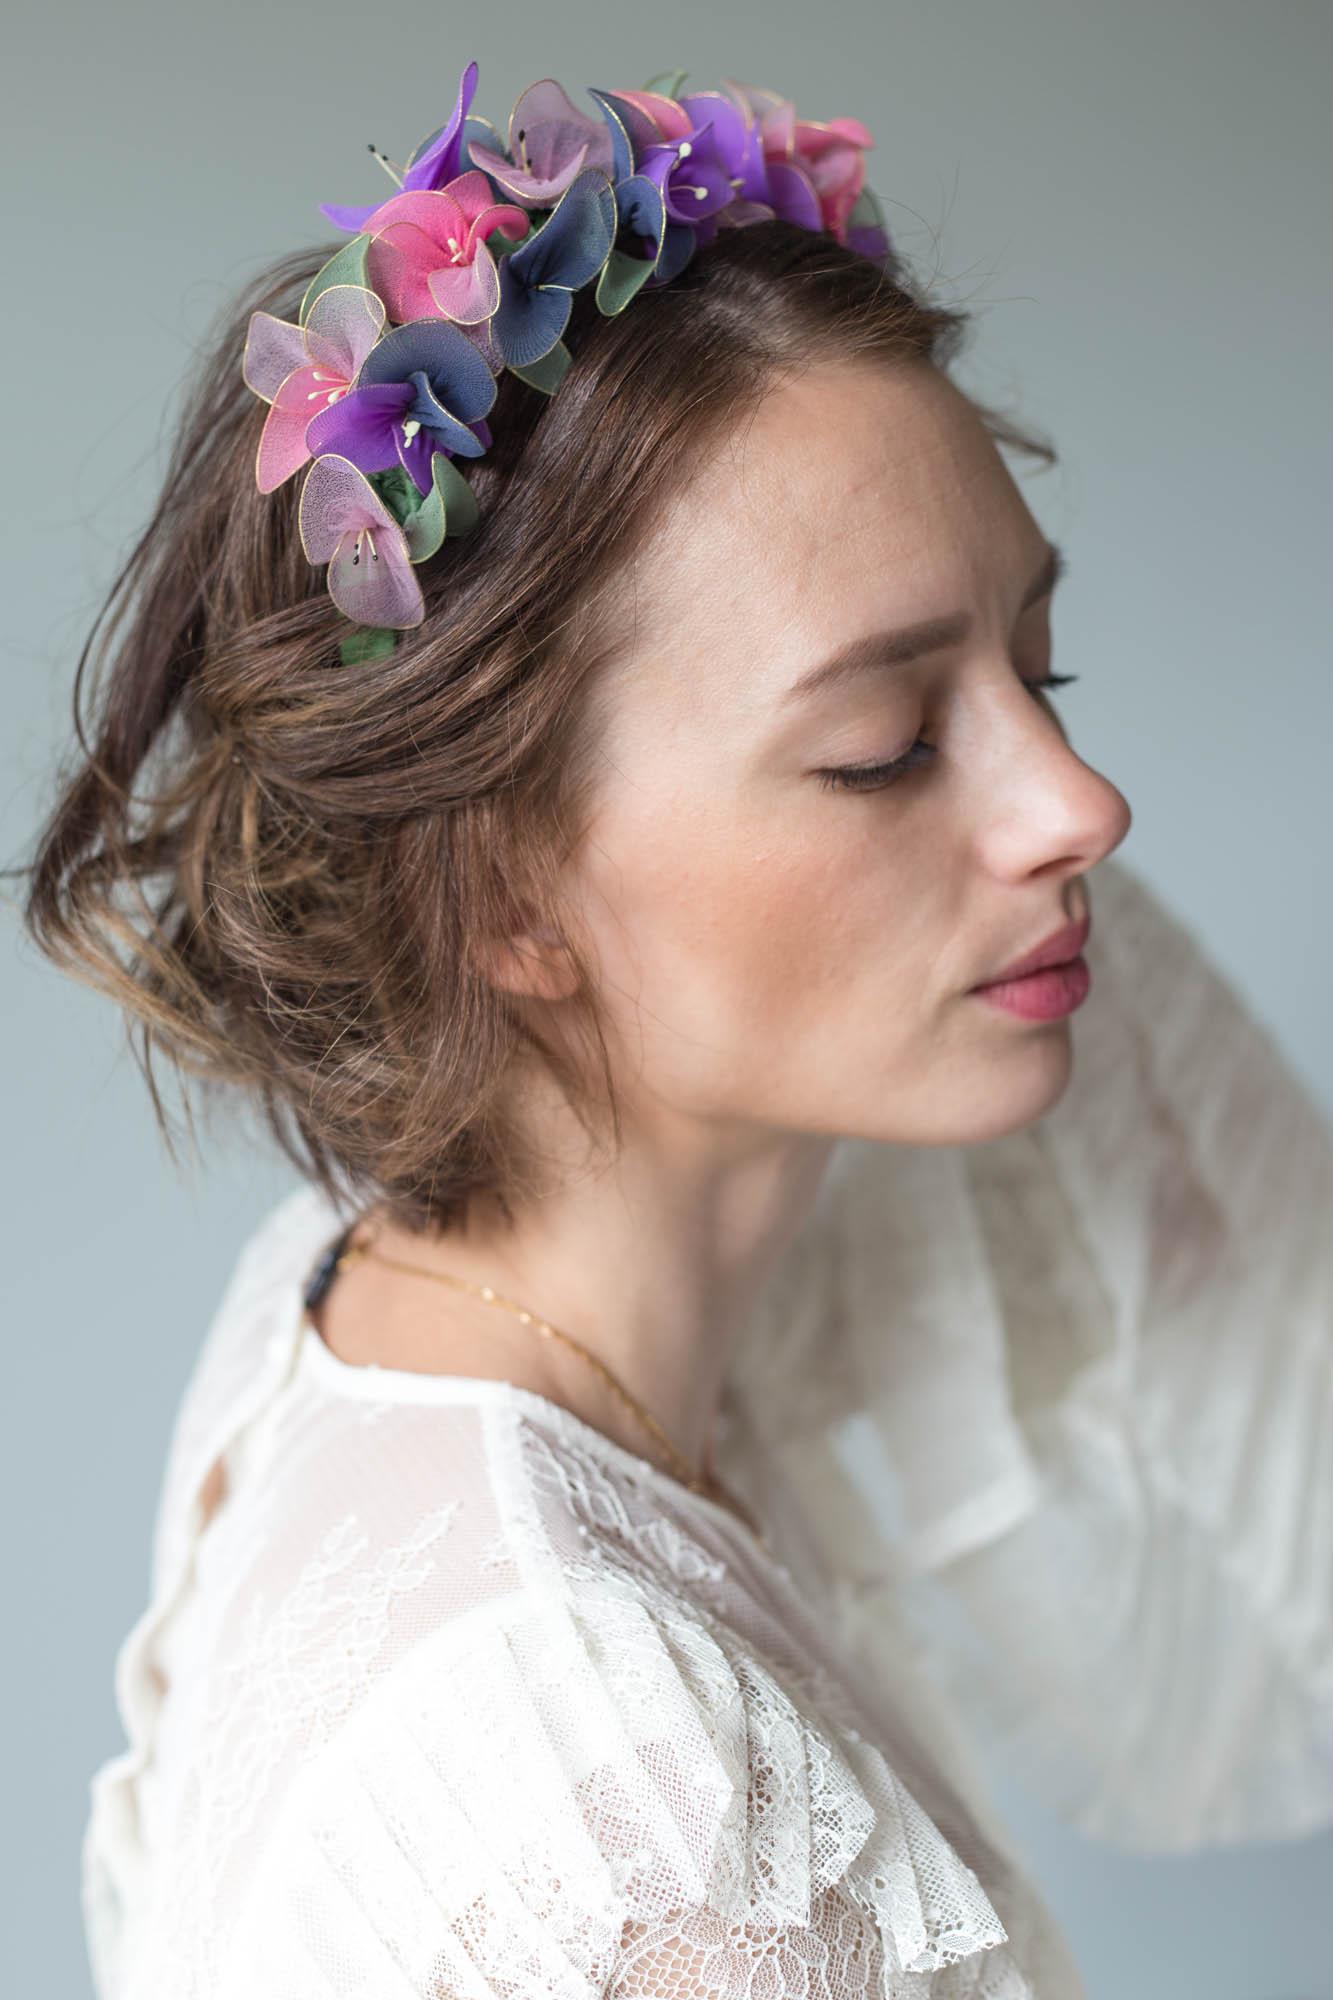 DIY Stocking Flower Crown | Dnilva